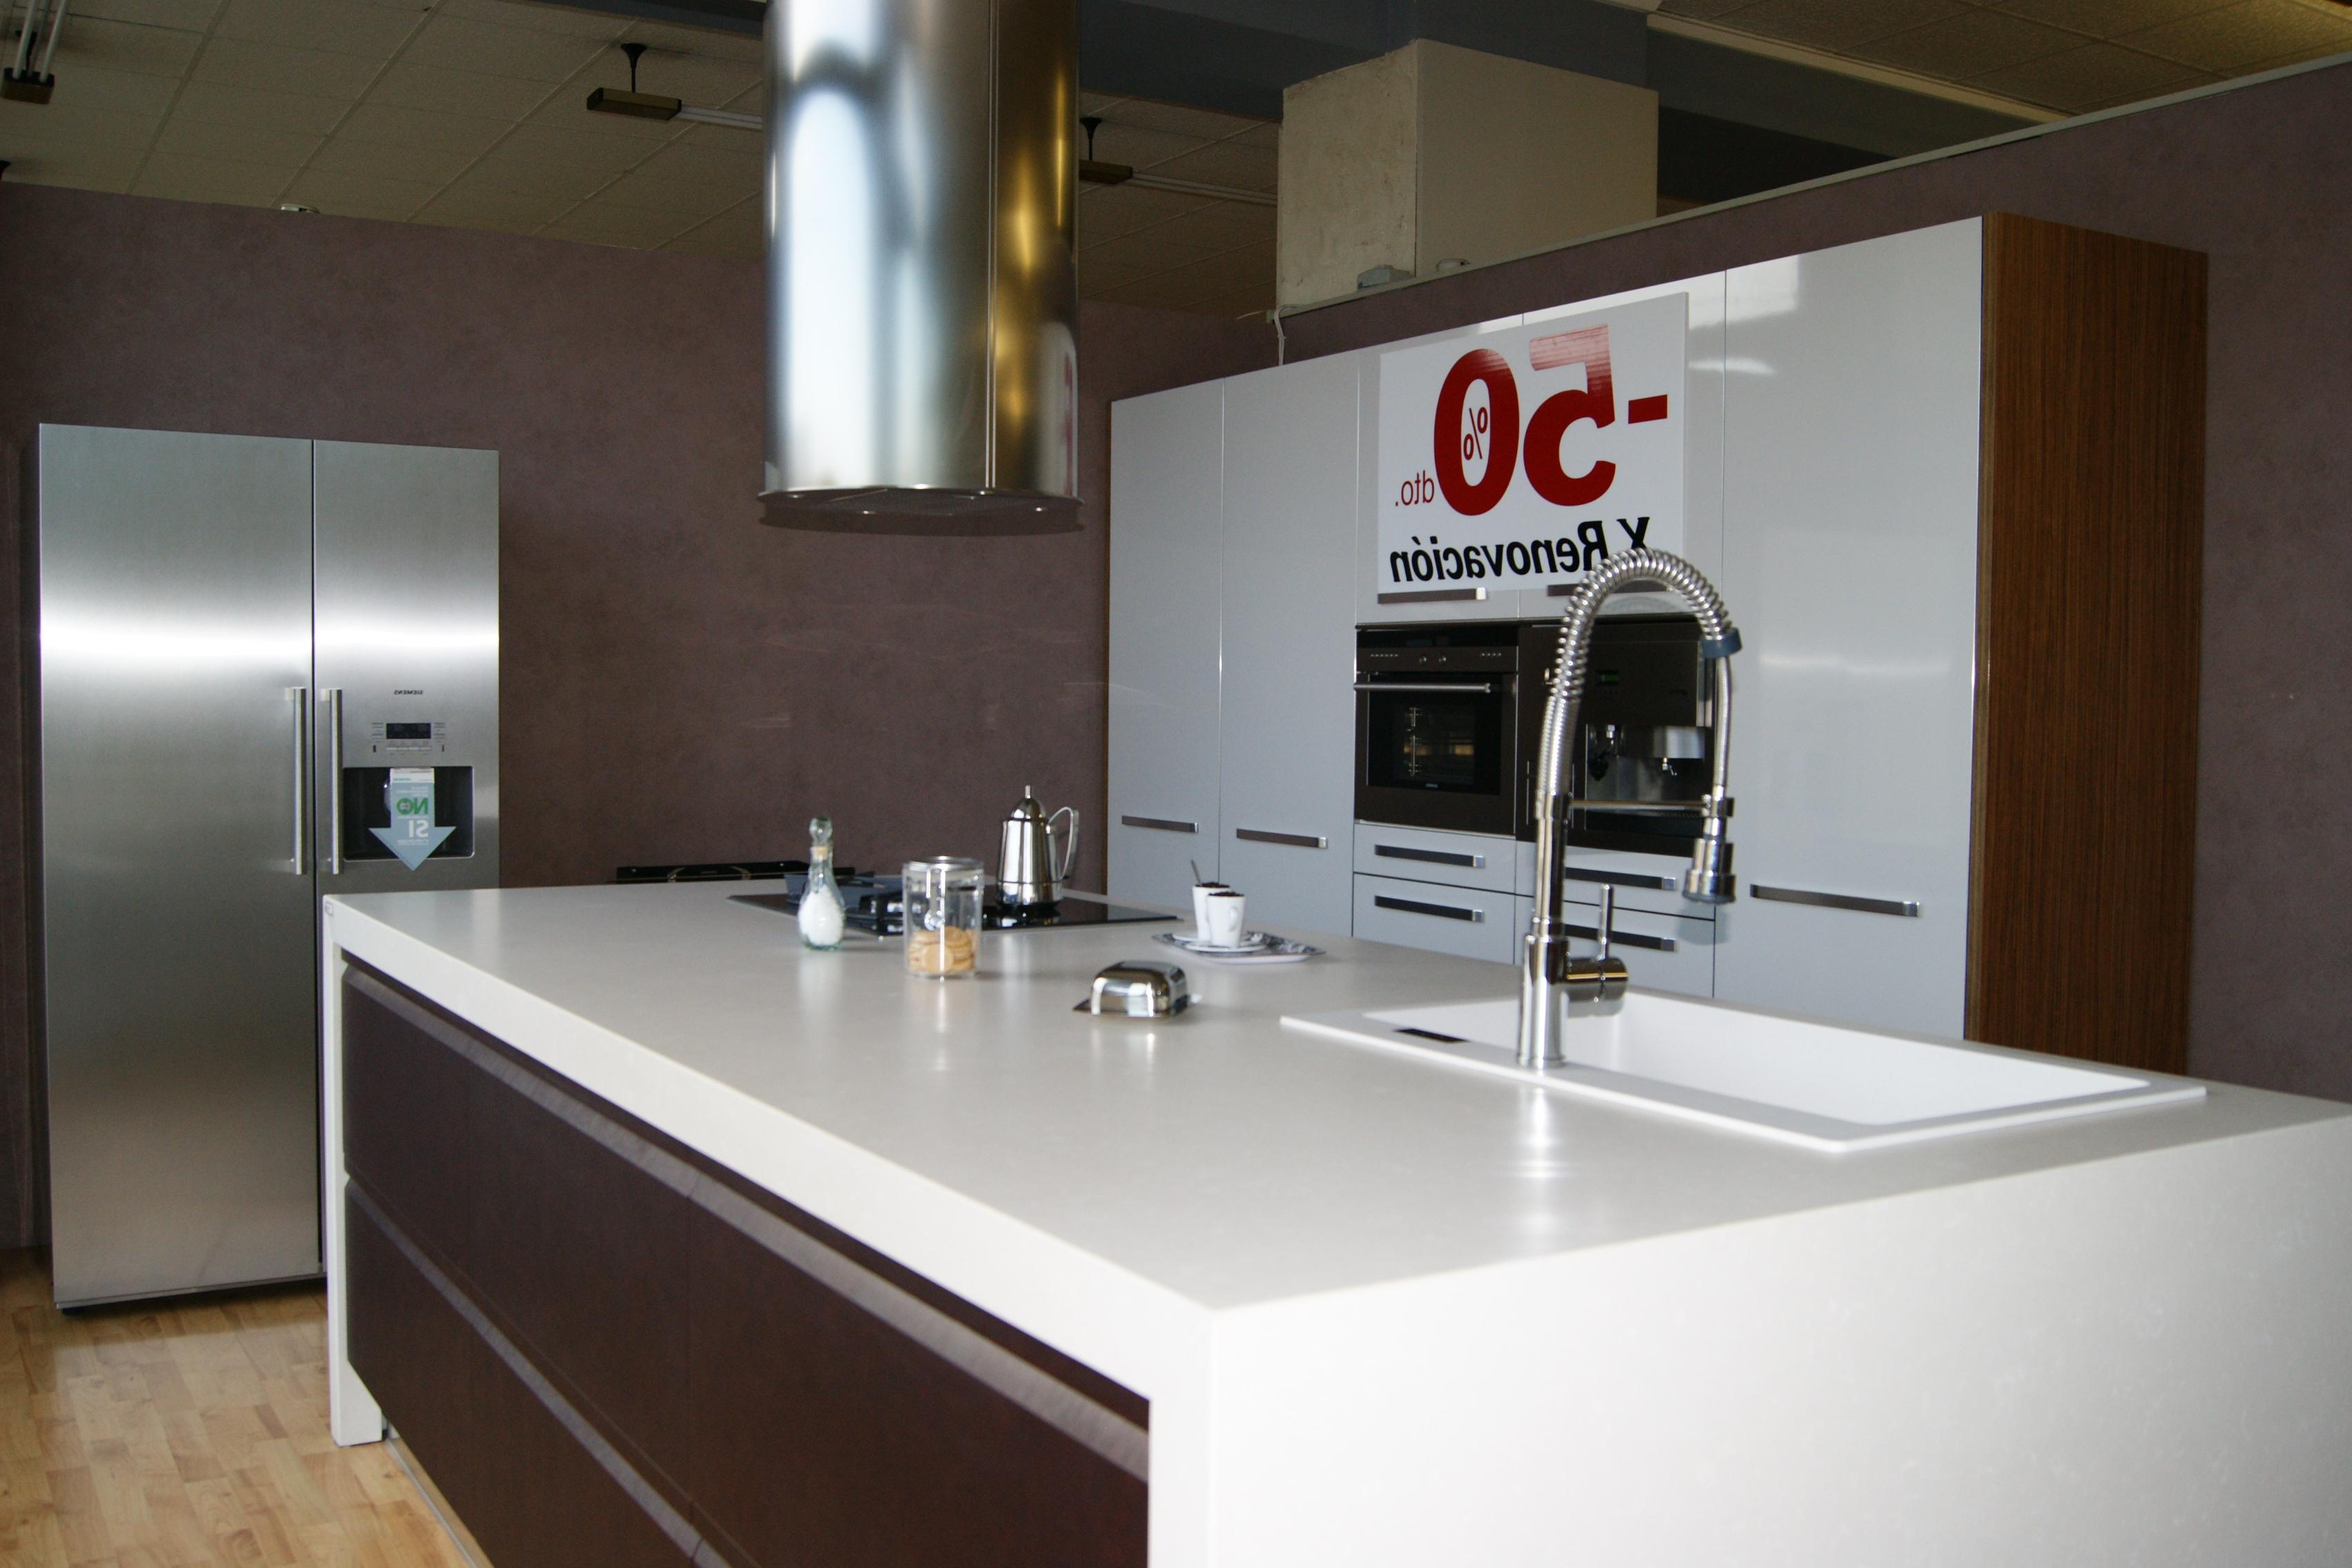 Muebles De Cocina De Exposicion Thdr Cocina Exposicion